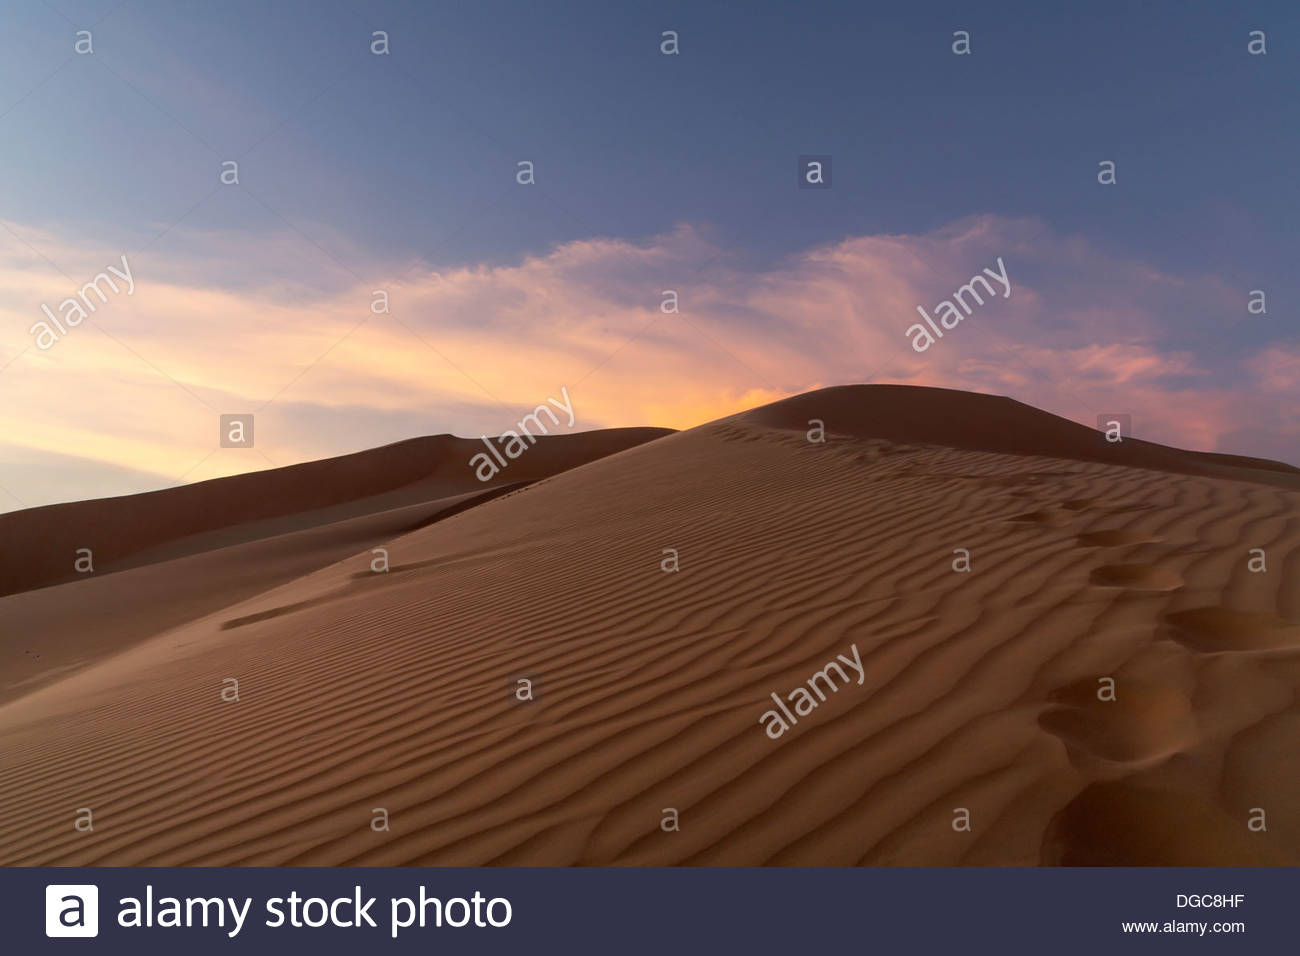 Sand dunes in desert at sunset, Adu Dhabi, United Arab Emirates - Stock Image